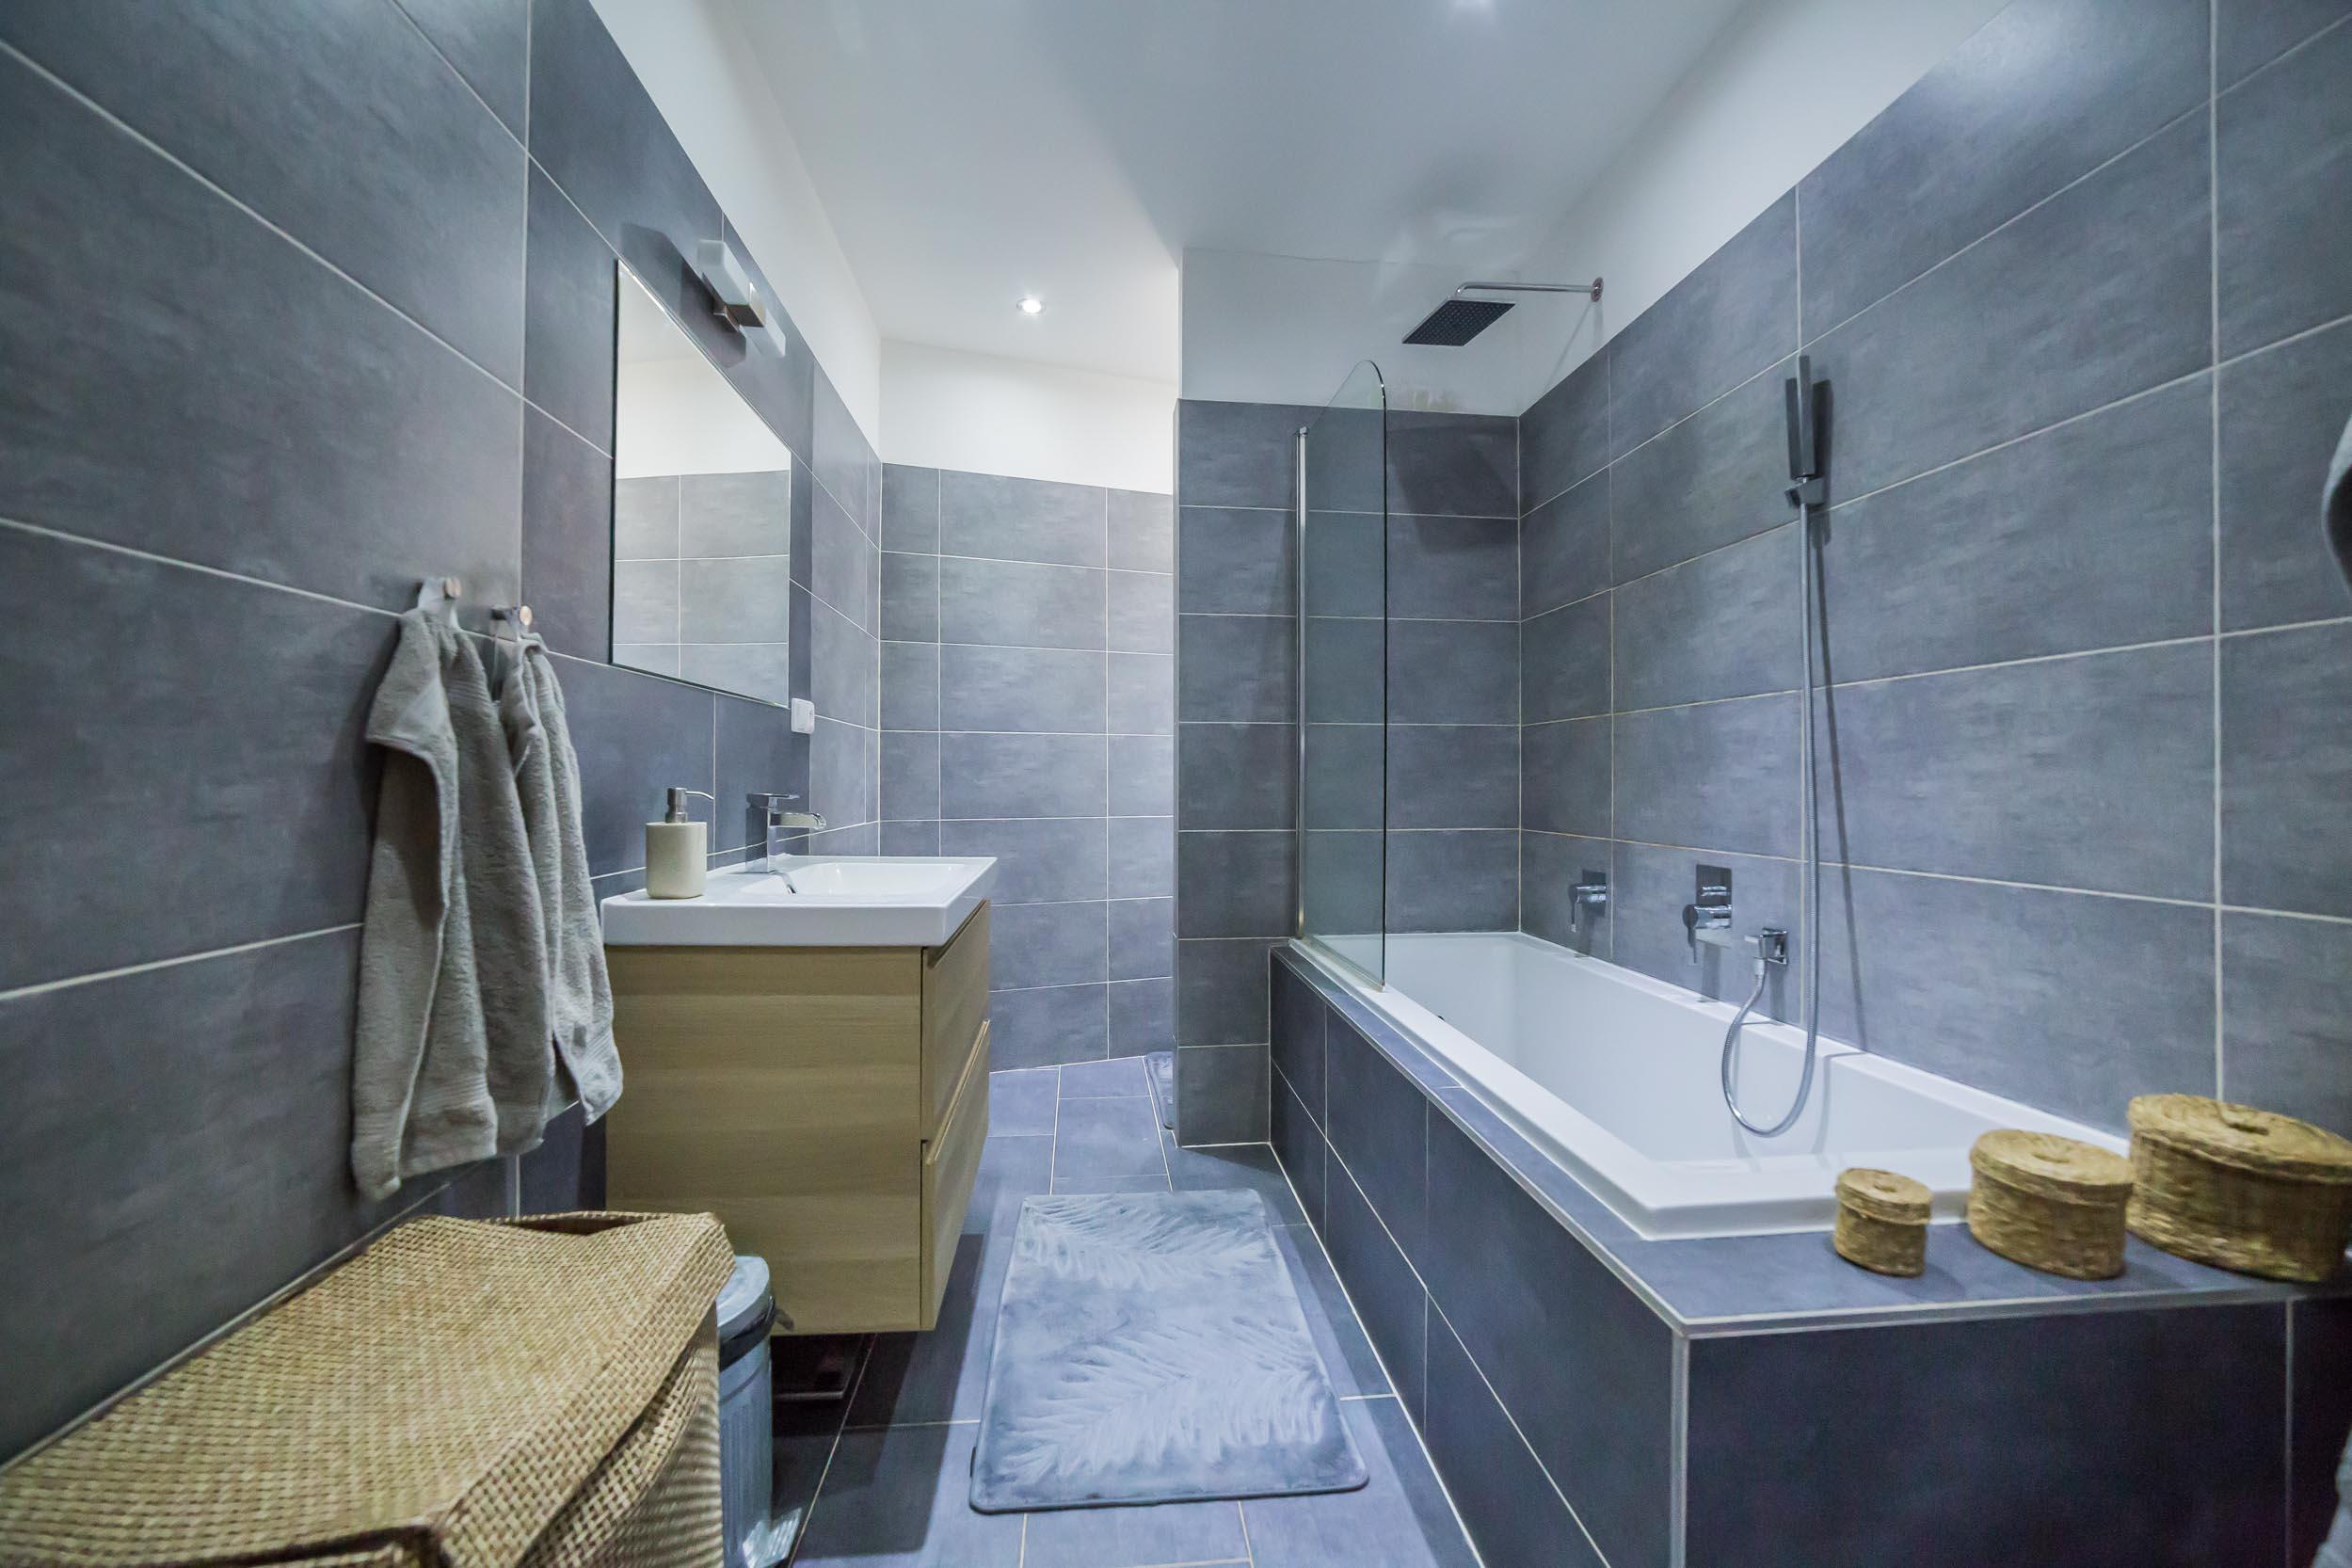 opava reality koupelna vana umyvadlo zrcadlo rucnik kosik svetlo koberec kosik